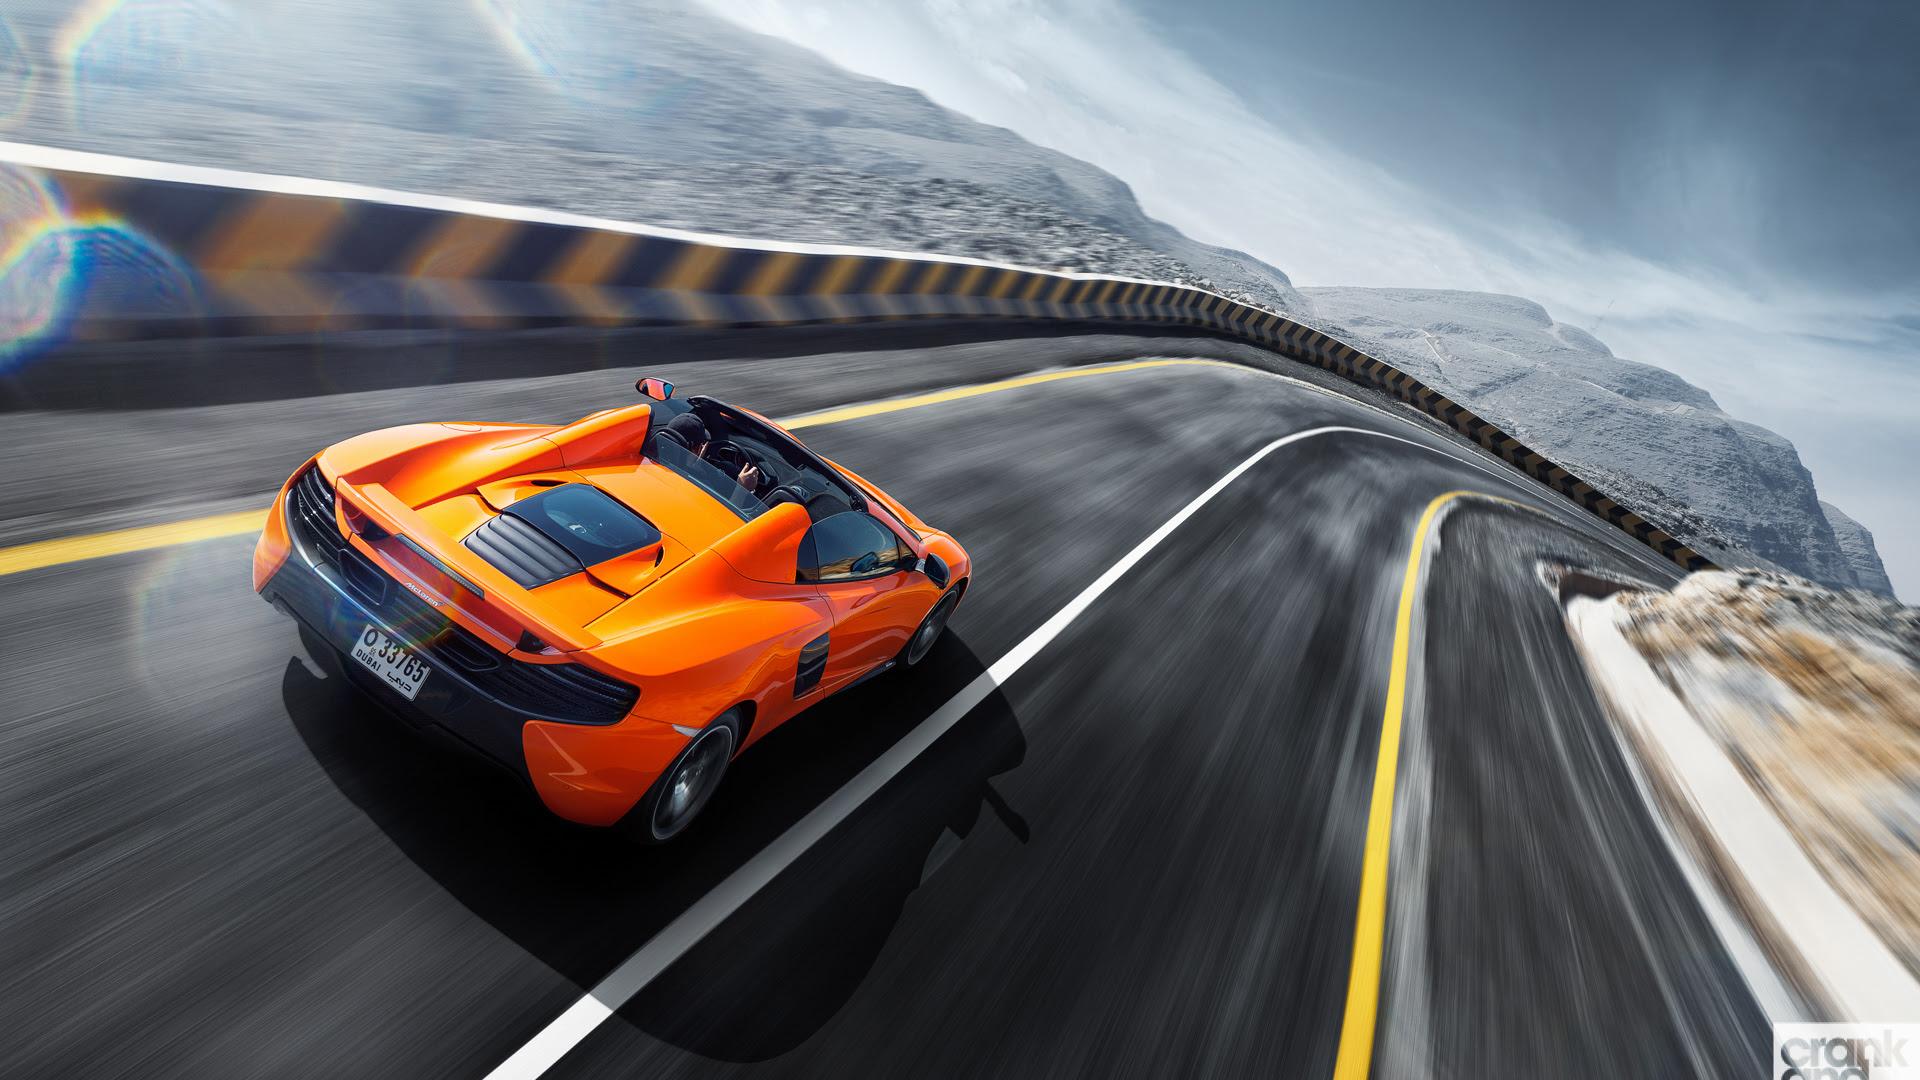 McLaren 650S Wallpaper | HD Car Wallpapers | ID #4910